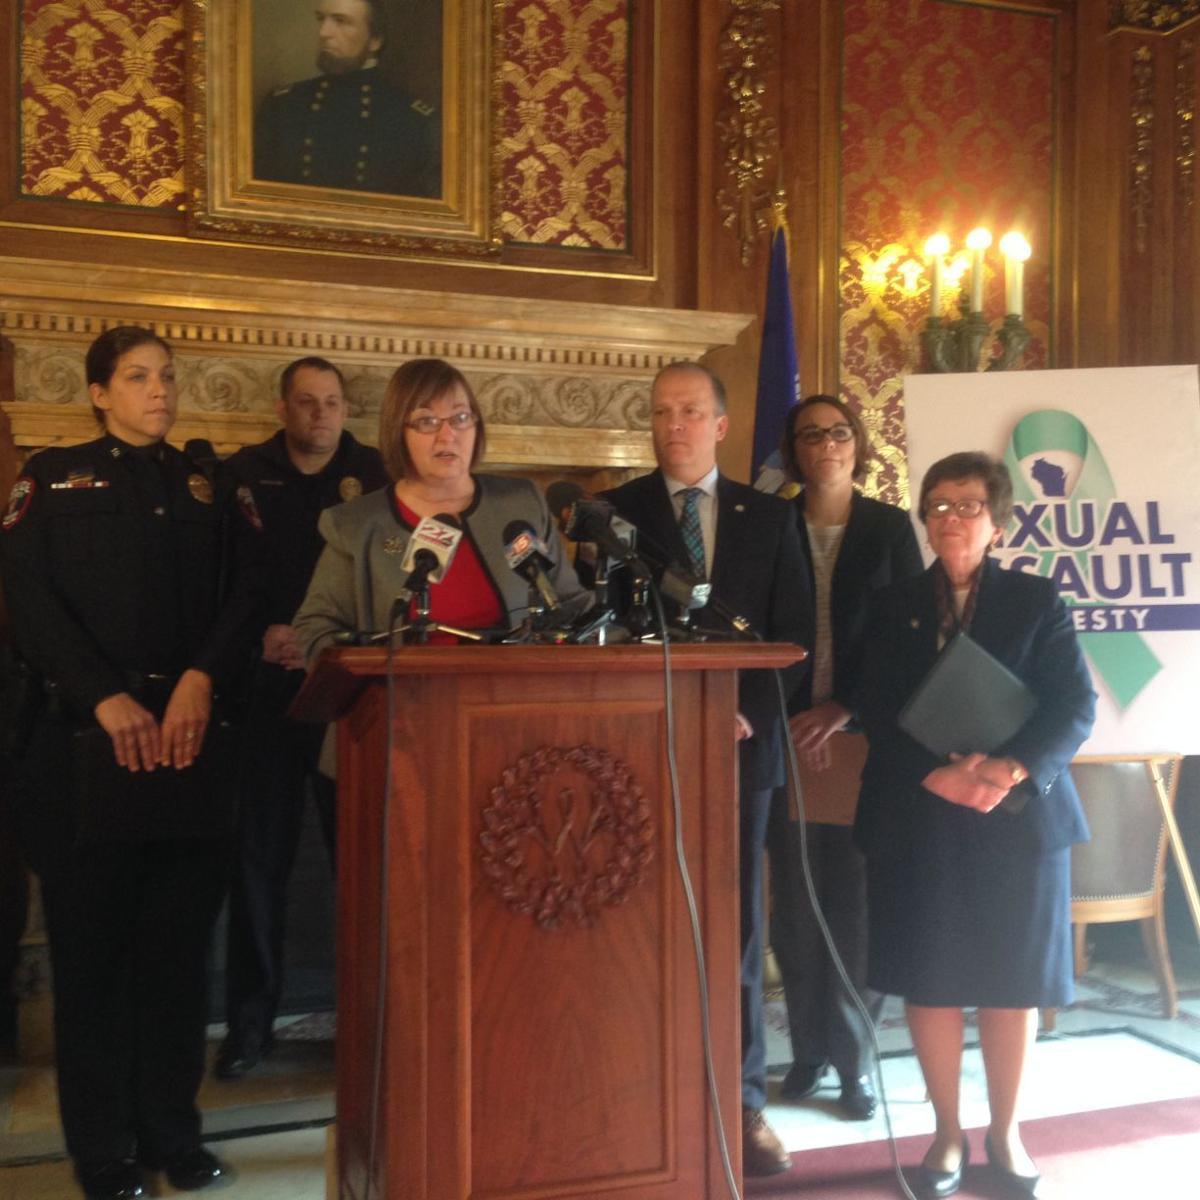 Sexual assault amnesty bill press conference